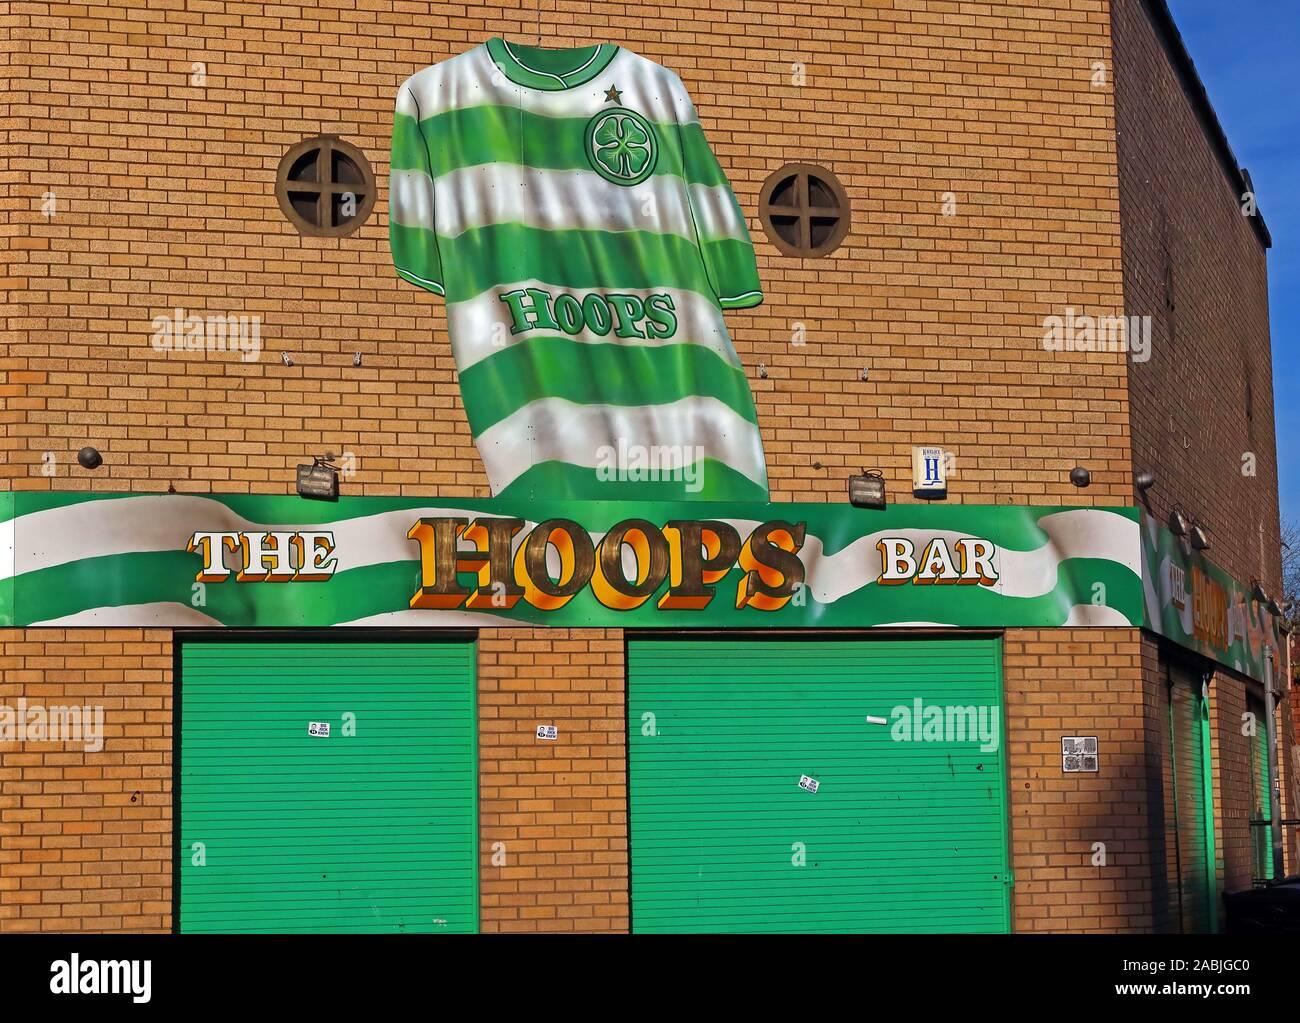 @HotpixUK,HotpixUK,GoTonySmith,UK,Glasgow,Scotland,City Centre,Strathclyde,The Barras,Markets,Gallowgate,G1,G1 5DX,Calton,bar,pub,supporters,green,white,football,soccer,sports